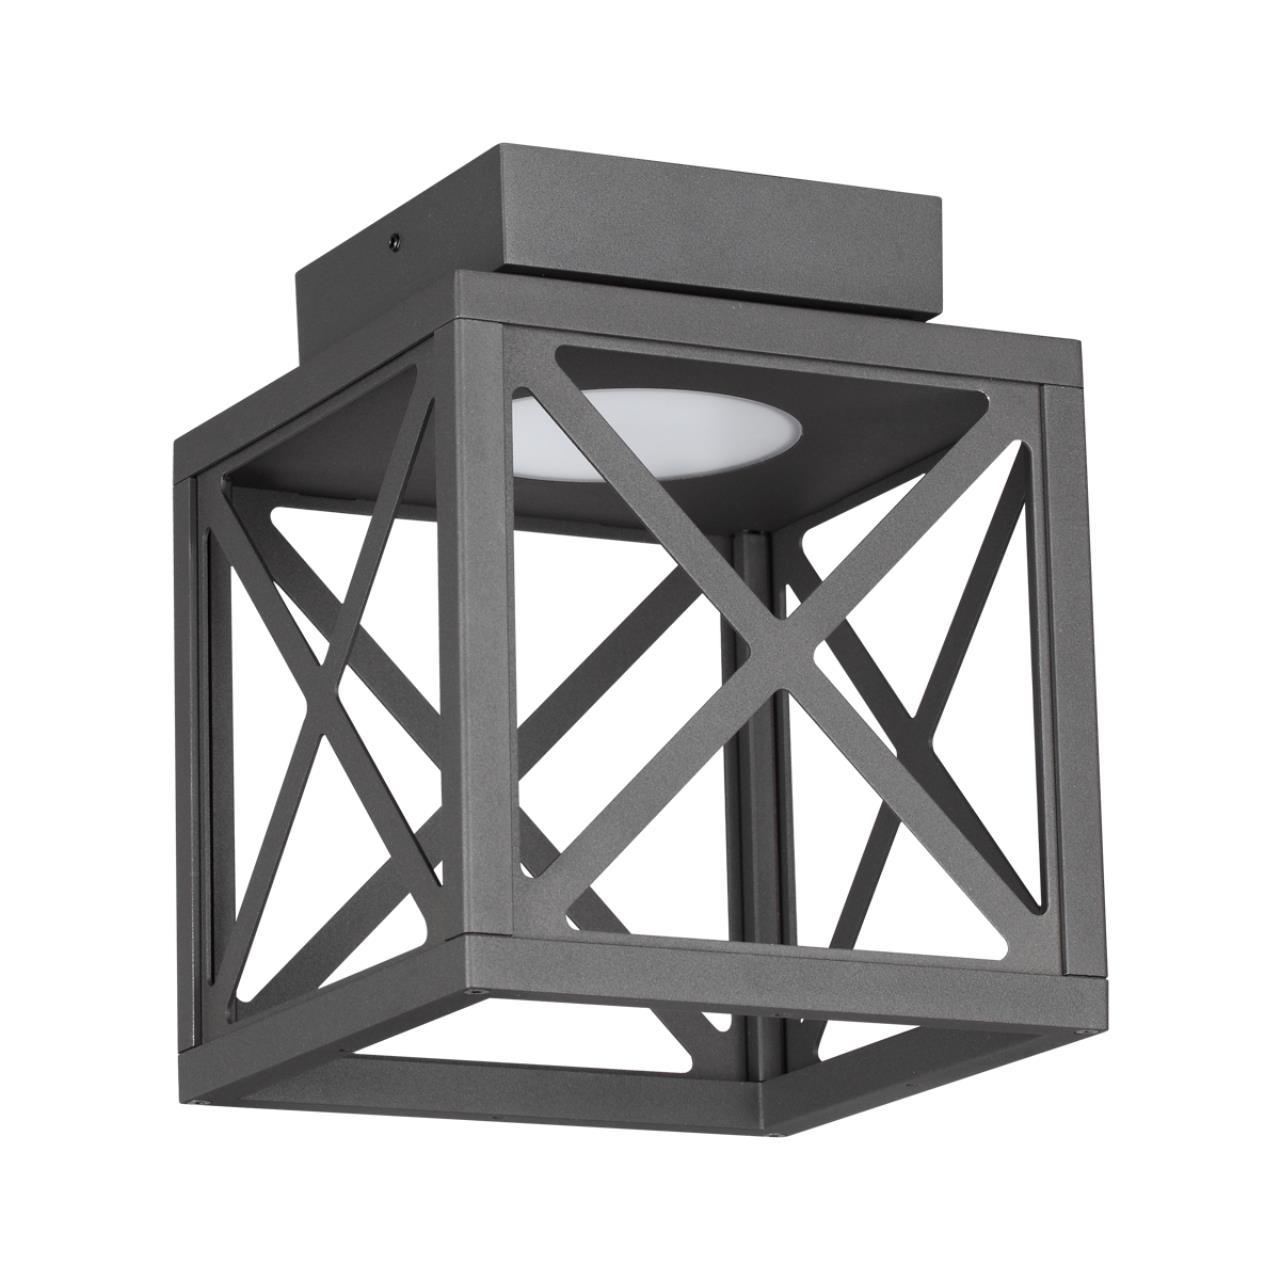 358449 STREET NT20 000 темно-серый Ландшафтный потолочный светильник IP54 LED 4000K 10W 100-240V DAN